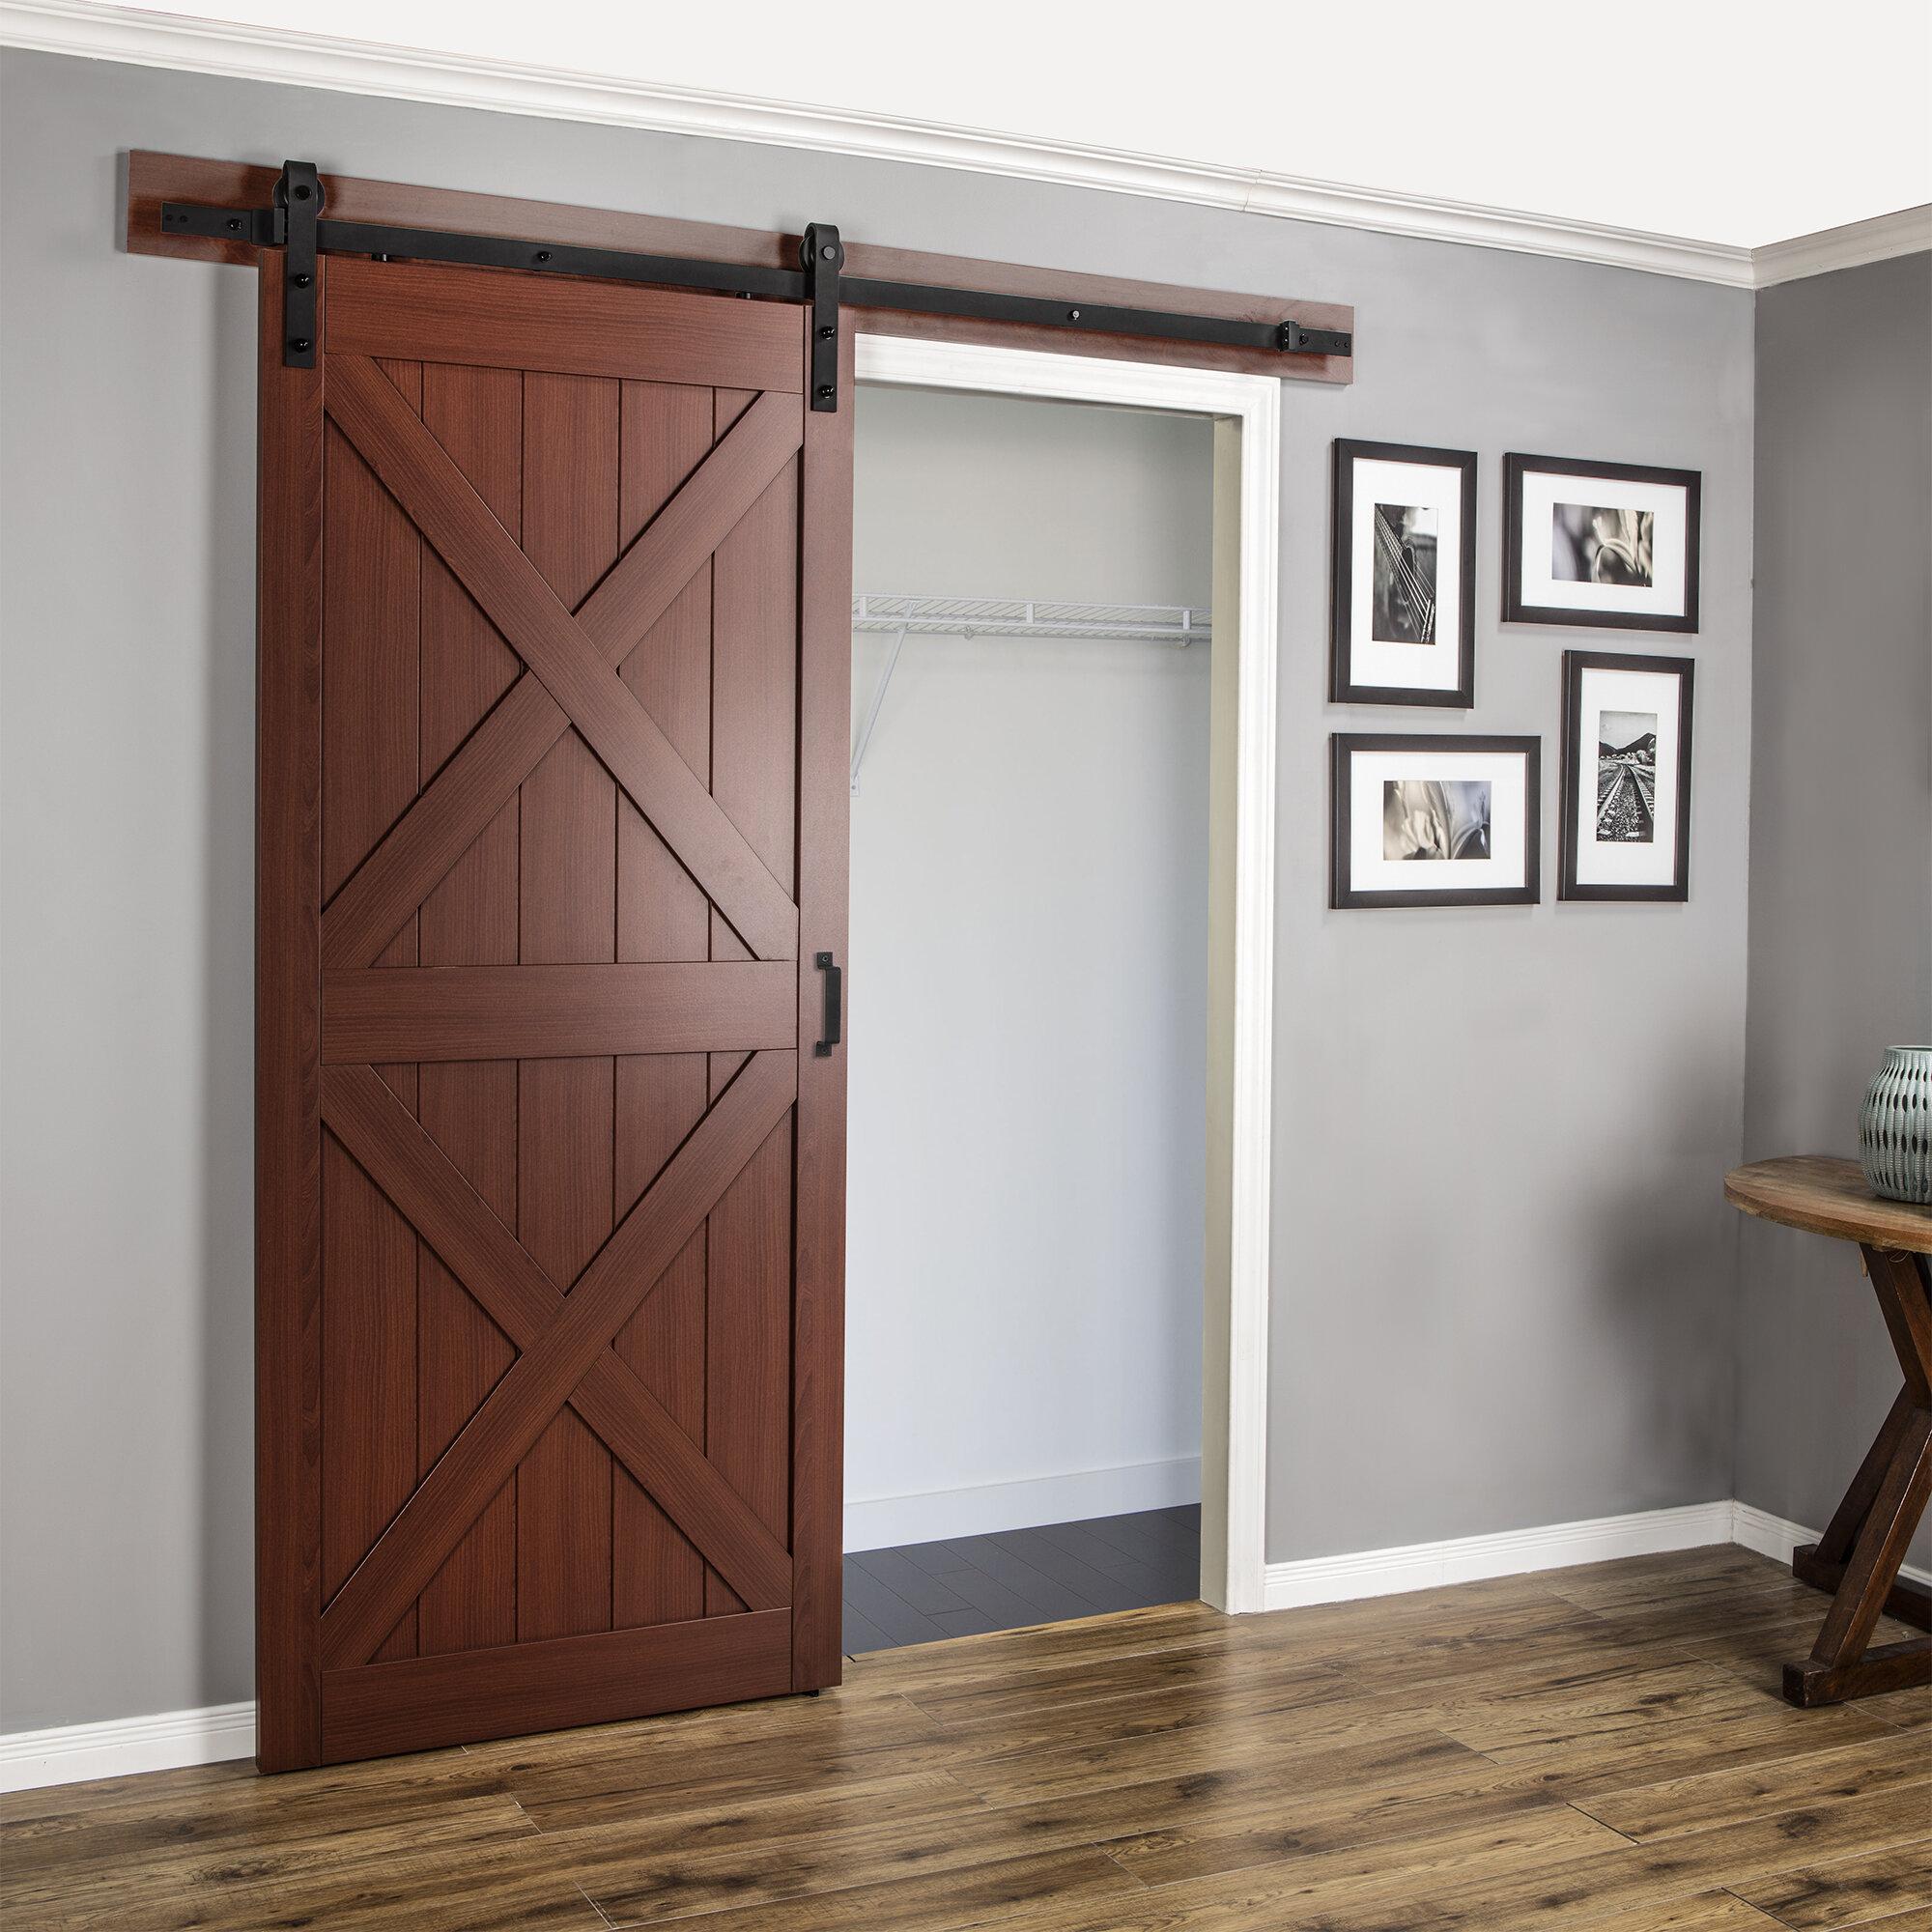 laundry glass sliding handballtunisie ideas lovely design home doors pergola surprising interior barn door of beautiful